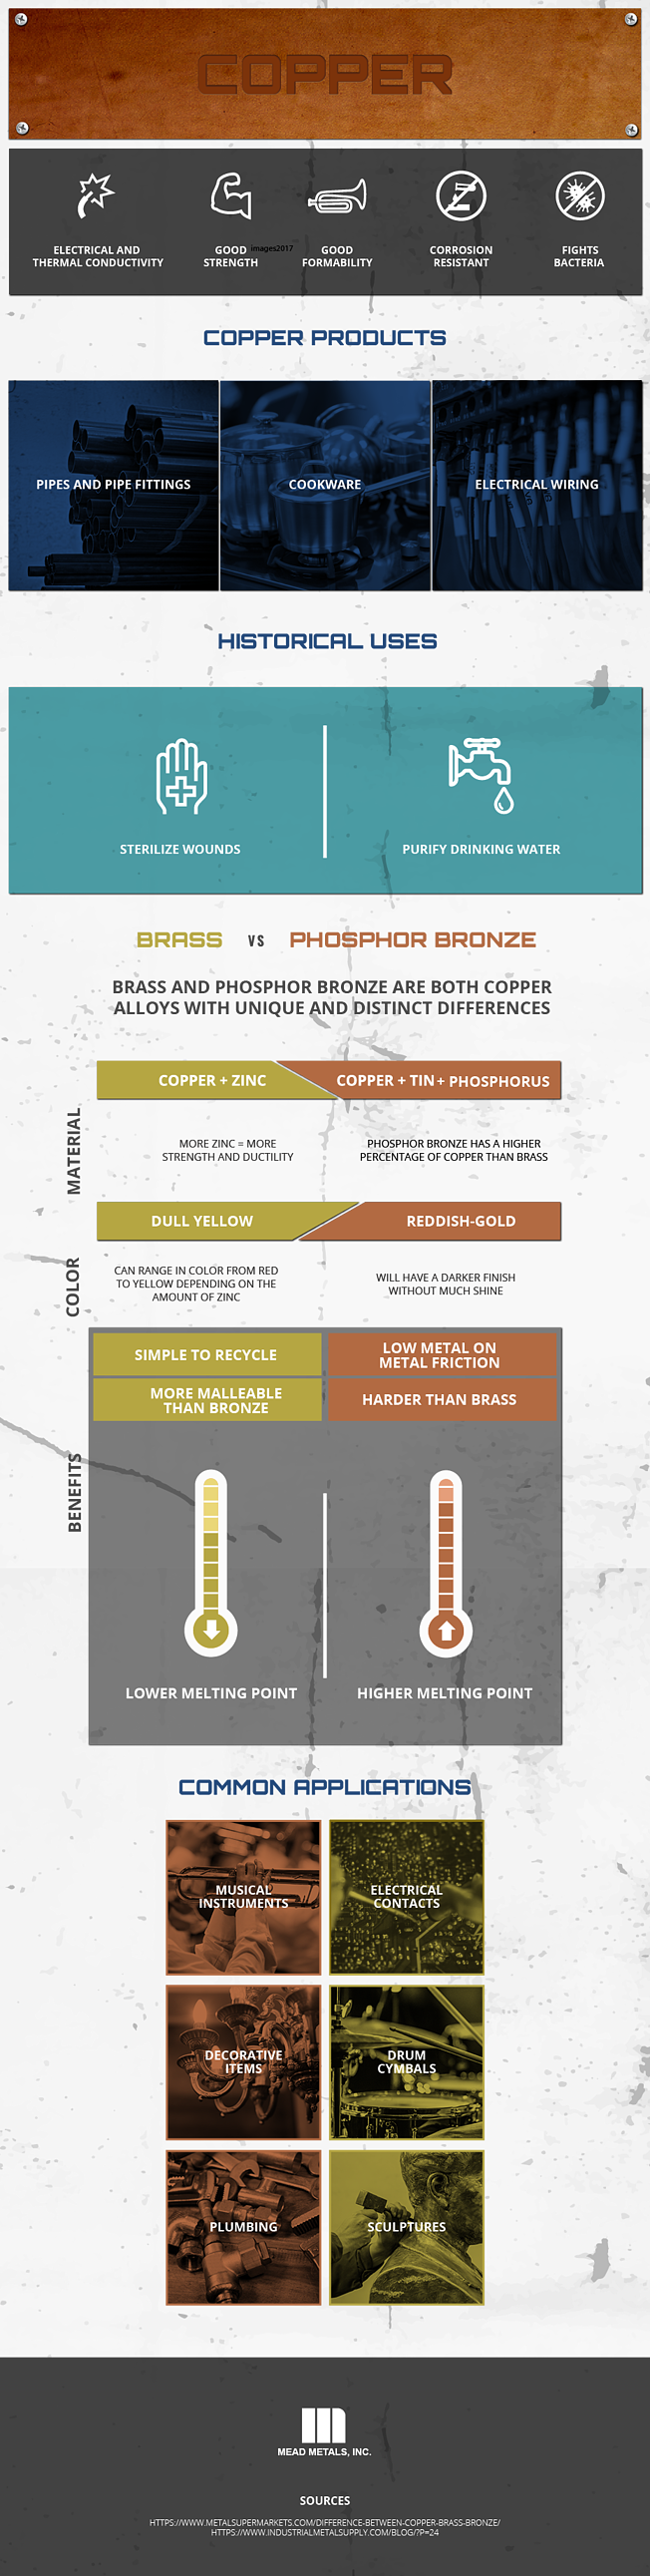 Copper: Brass vs Phosphor Bronze Infographic